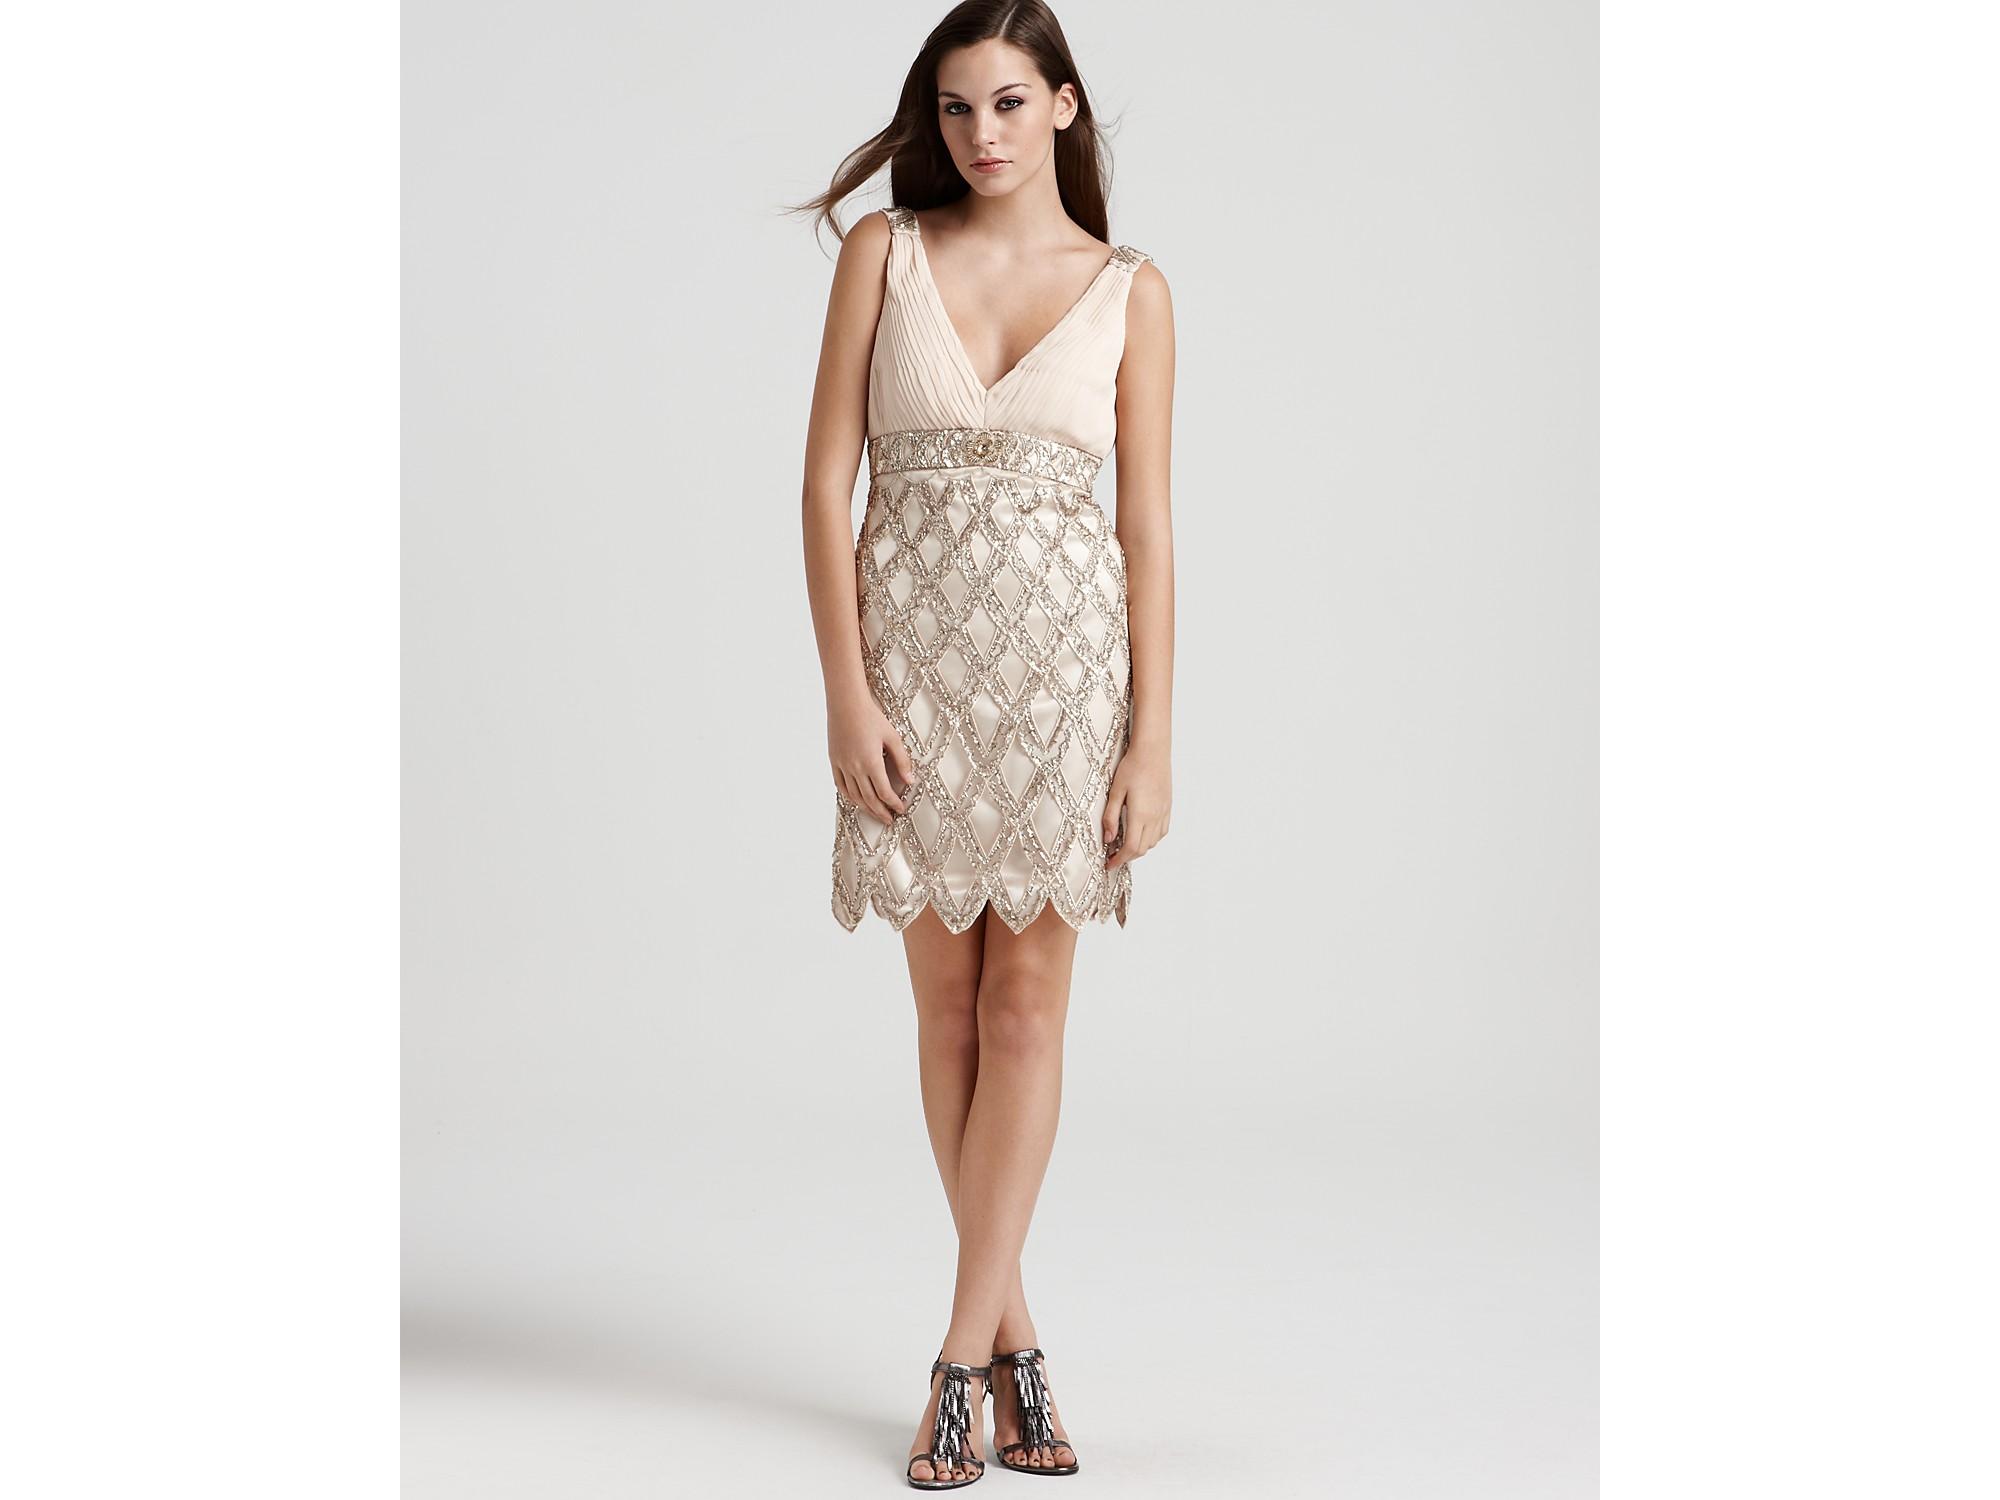 Details about Sue Wong Embellished Flapper Dress( Size 14)